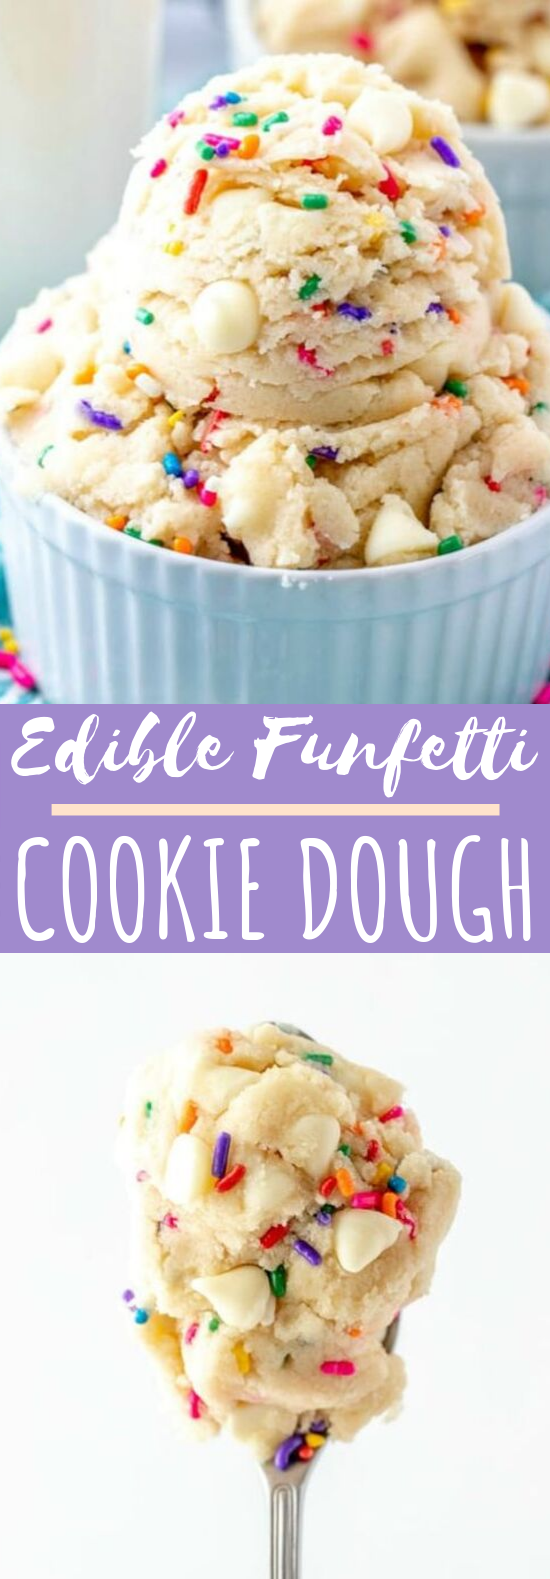 Funfetti Edible Cookie Dough #desserts #cookies